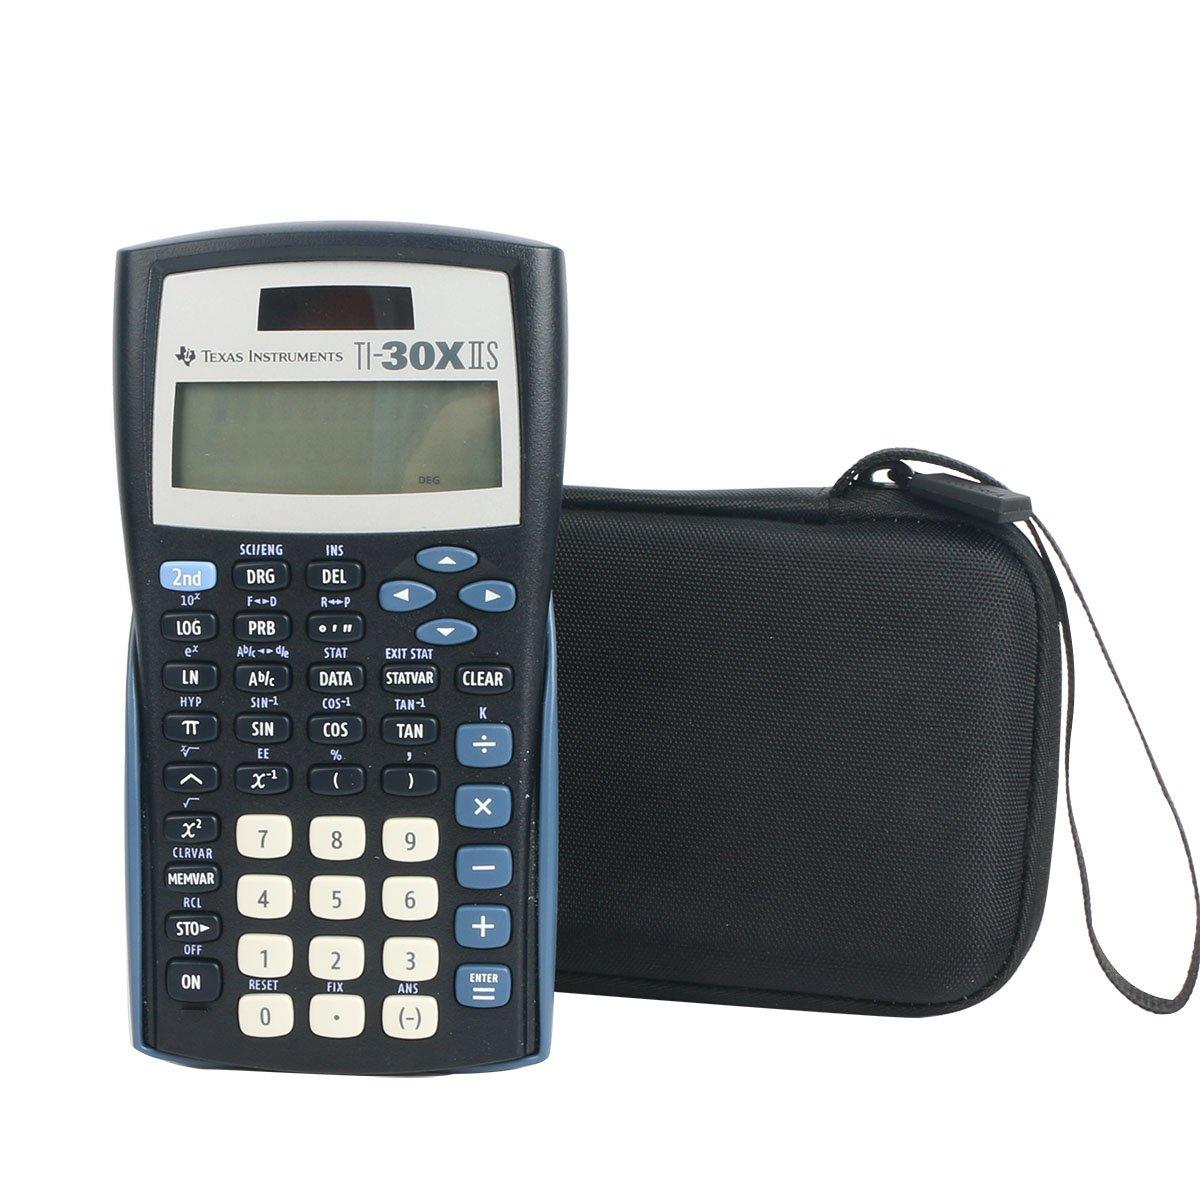 Amazon.com : co2CREA Carrying Travel Storage Organizer Case Bag for Texas  Instruments TI-30Xa/TI-30X IIS 2-Line Scientific Calculator : Electronics